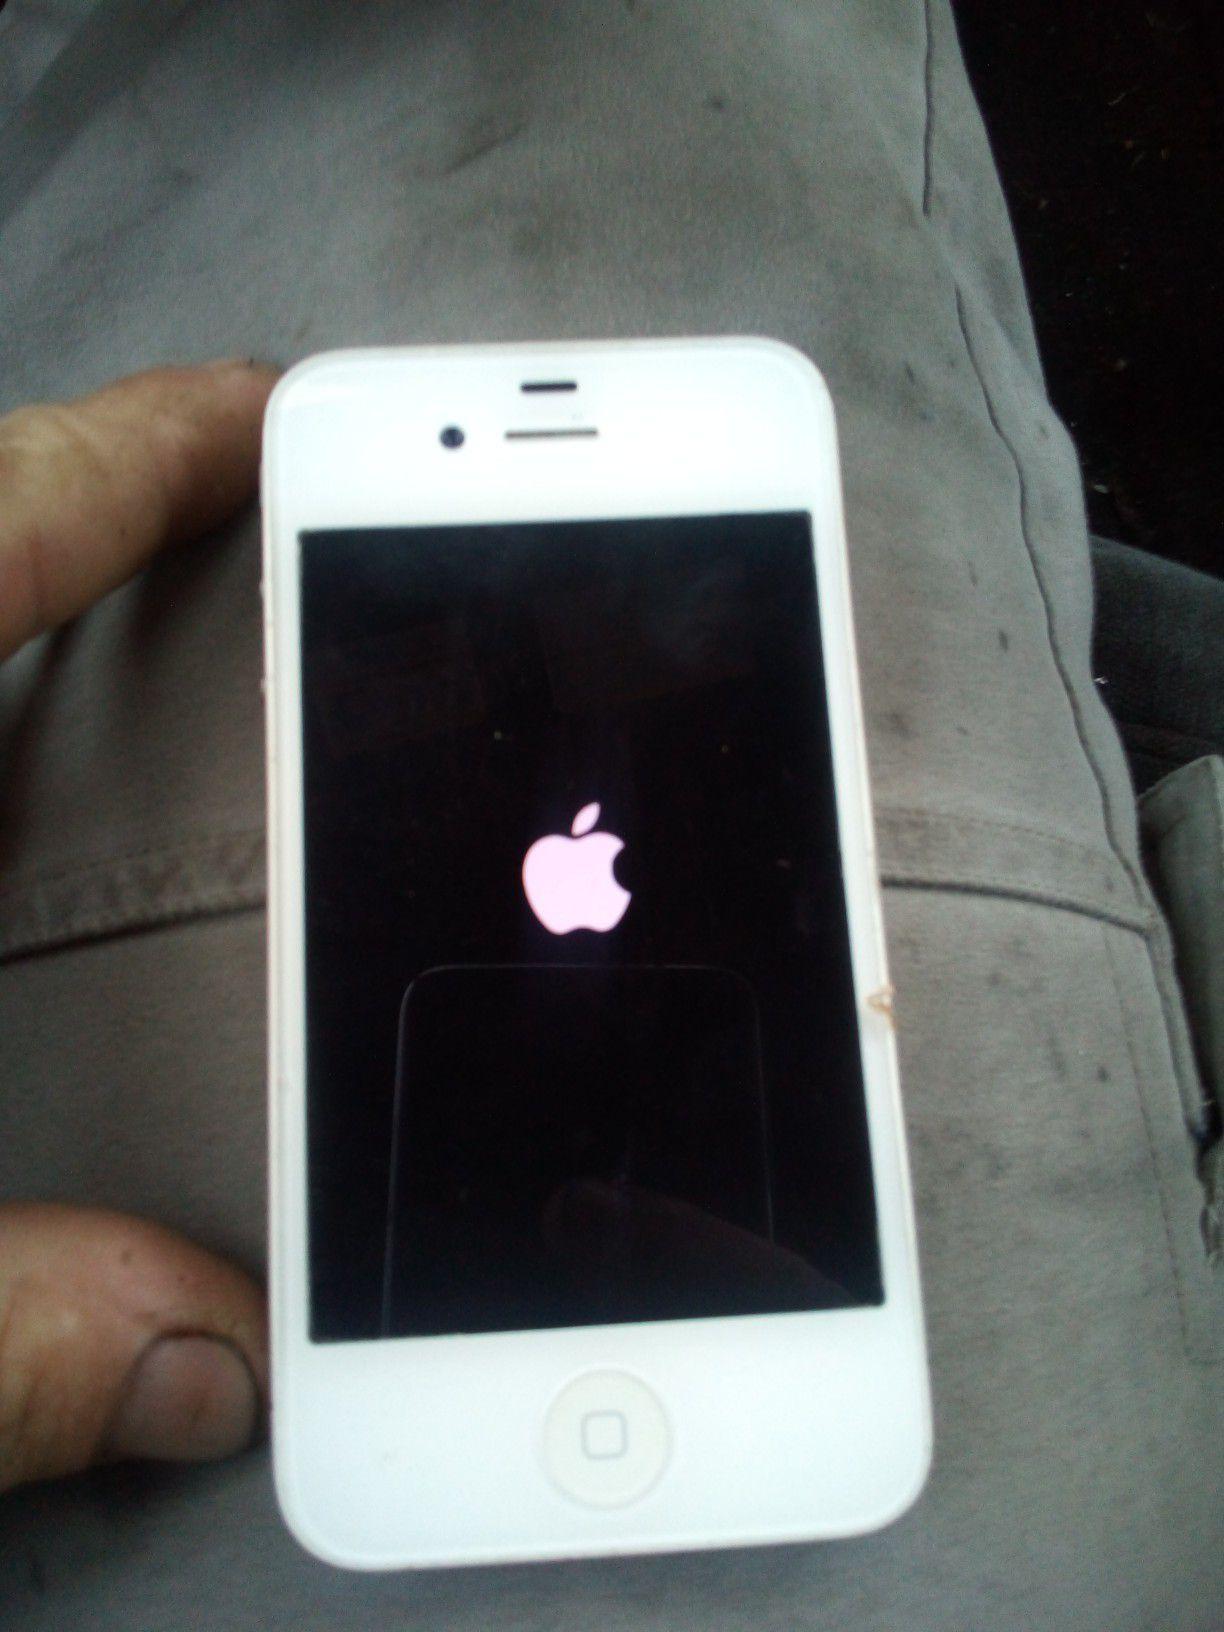 iPhone 4 locked $10